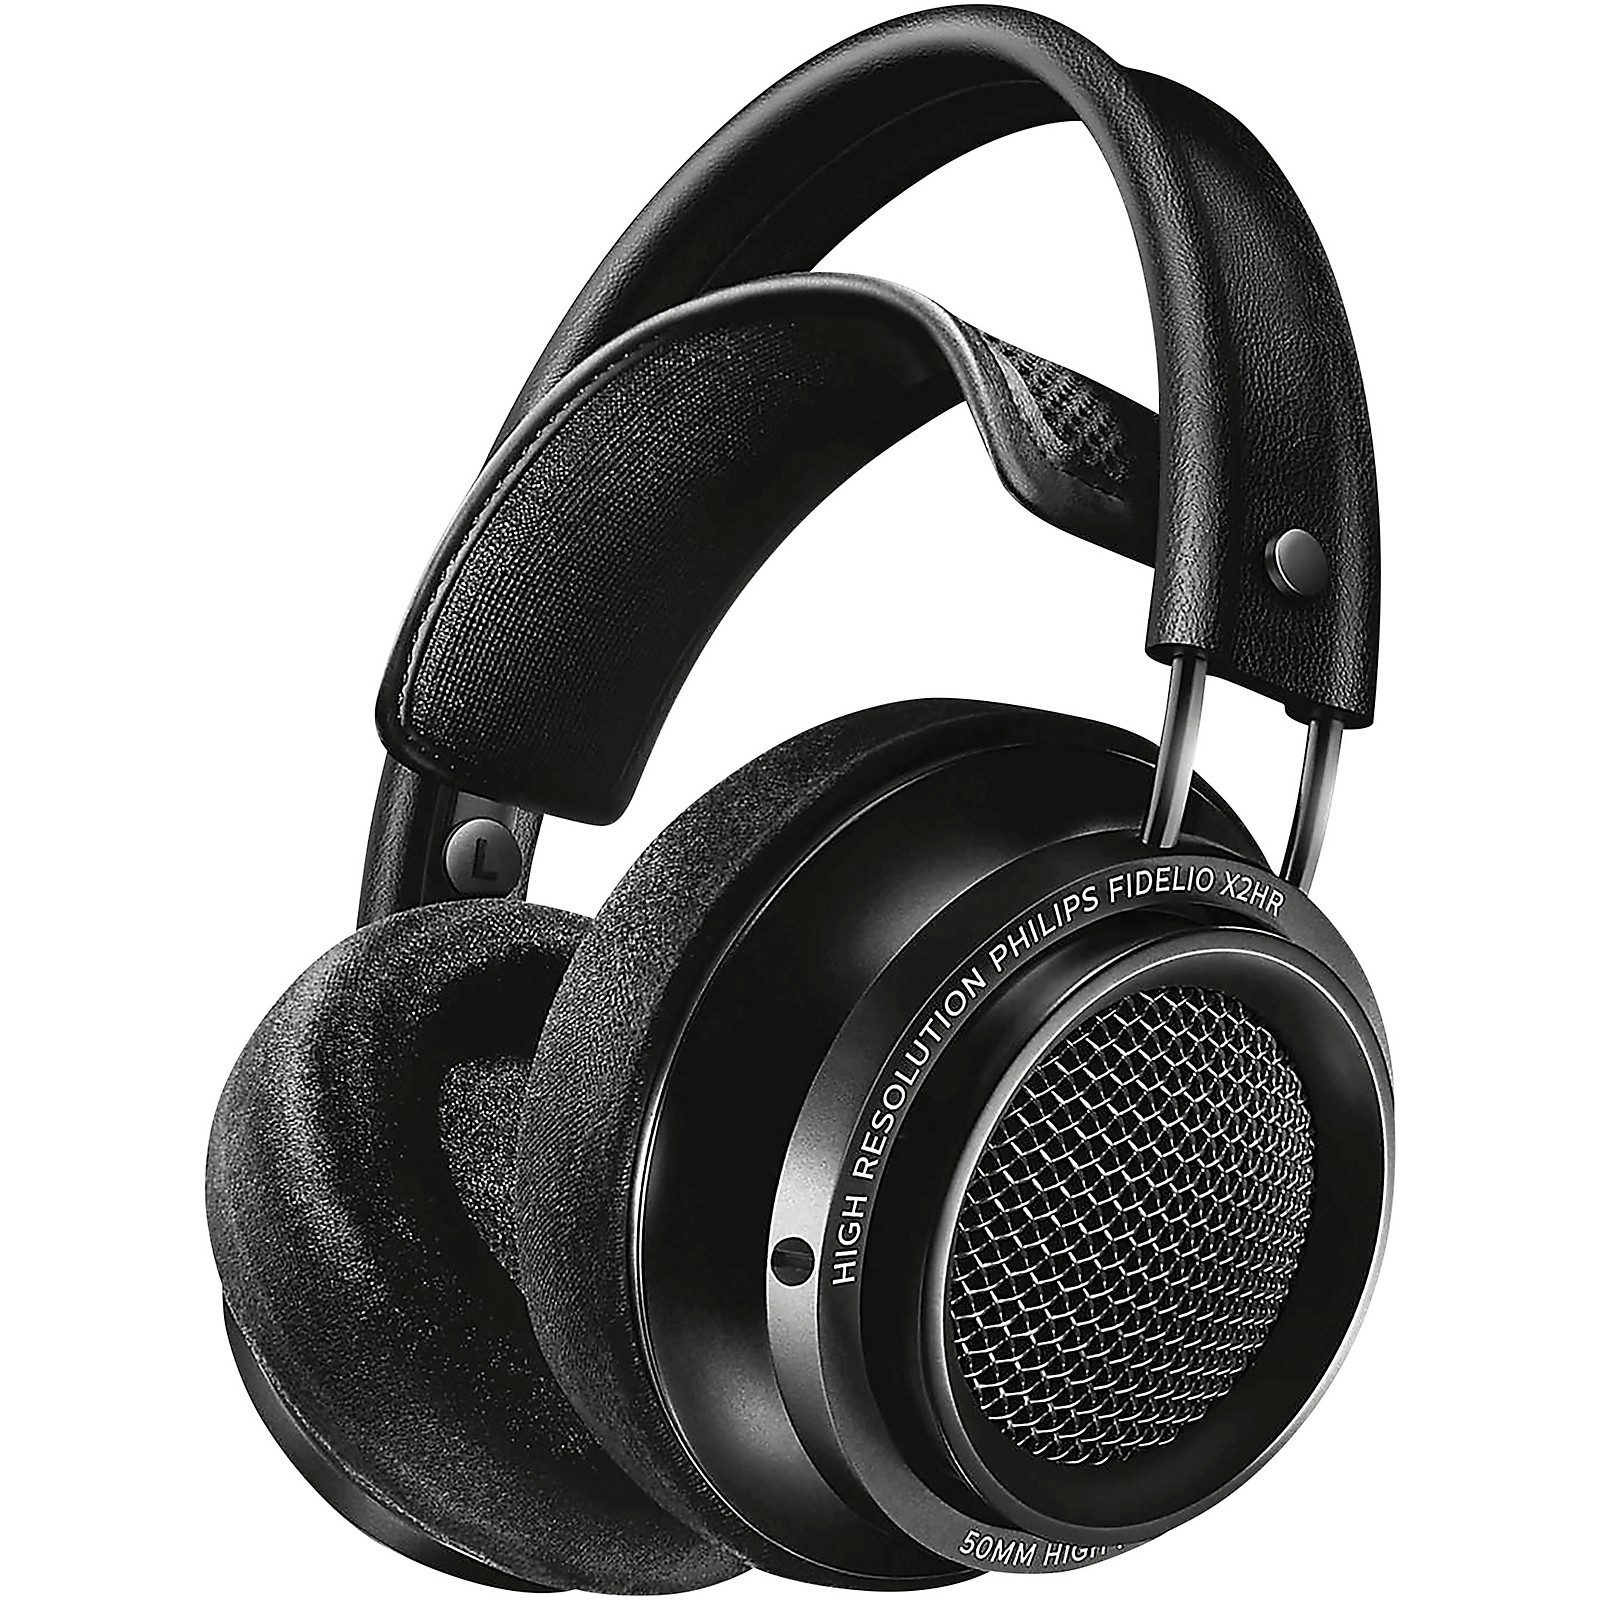 Philips Fidelio X2HR Hi-Res Headphones